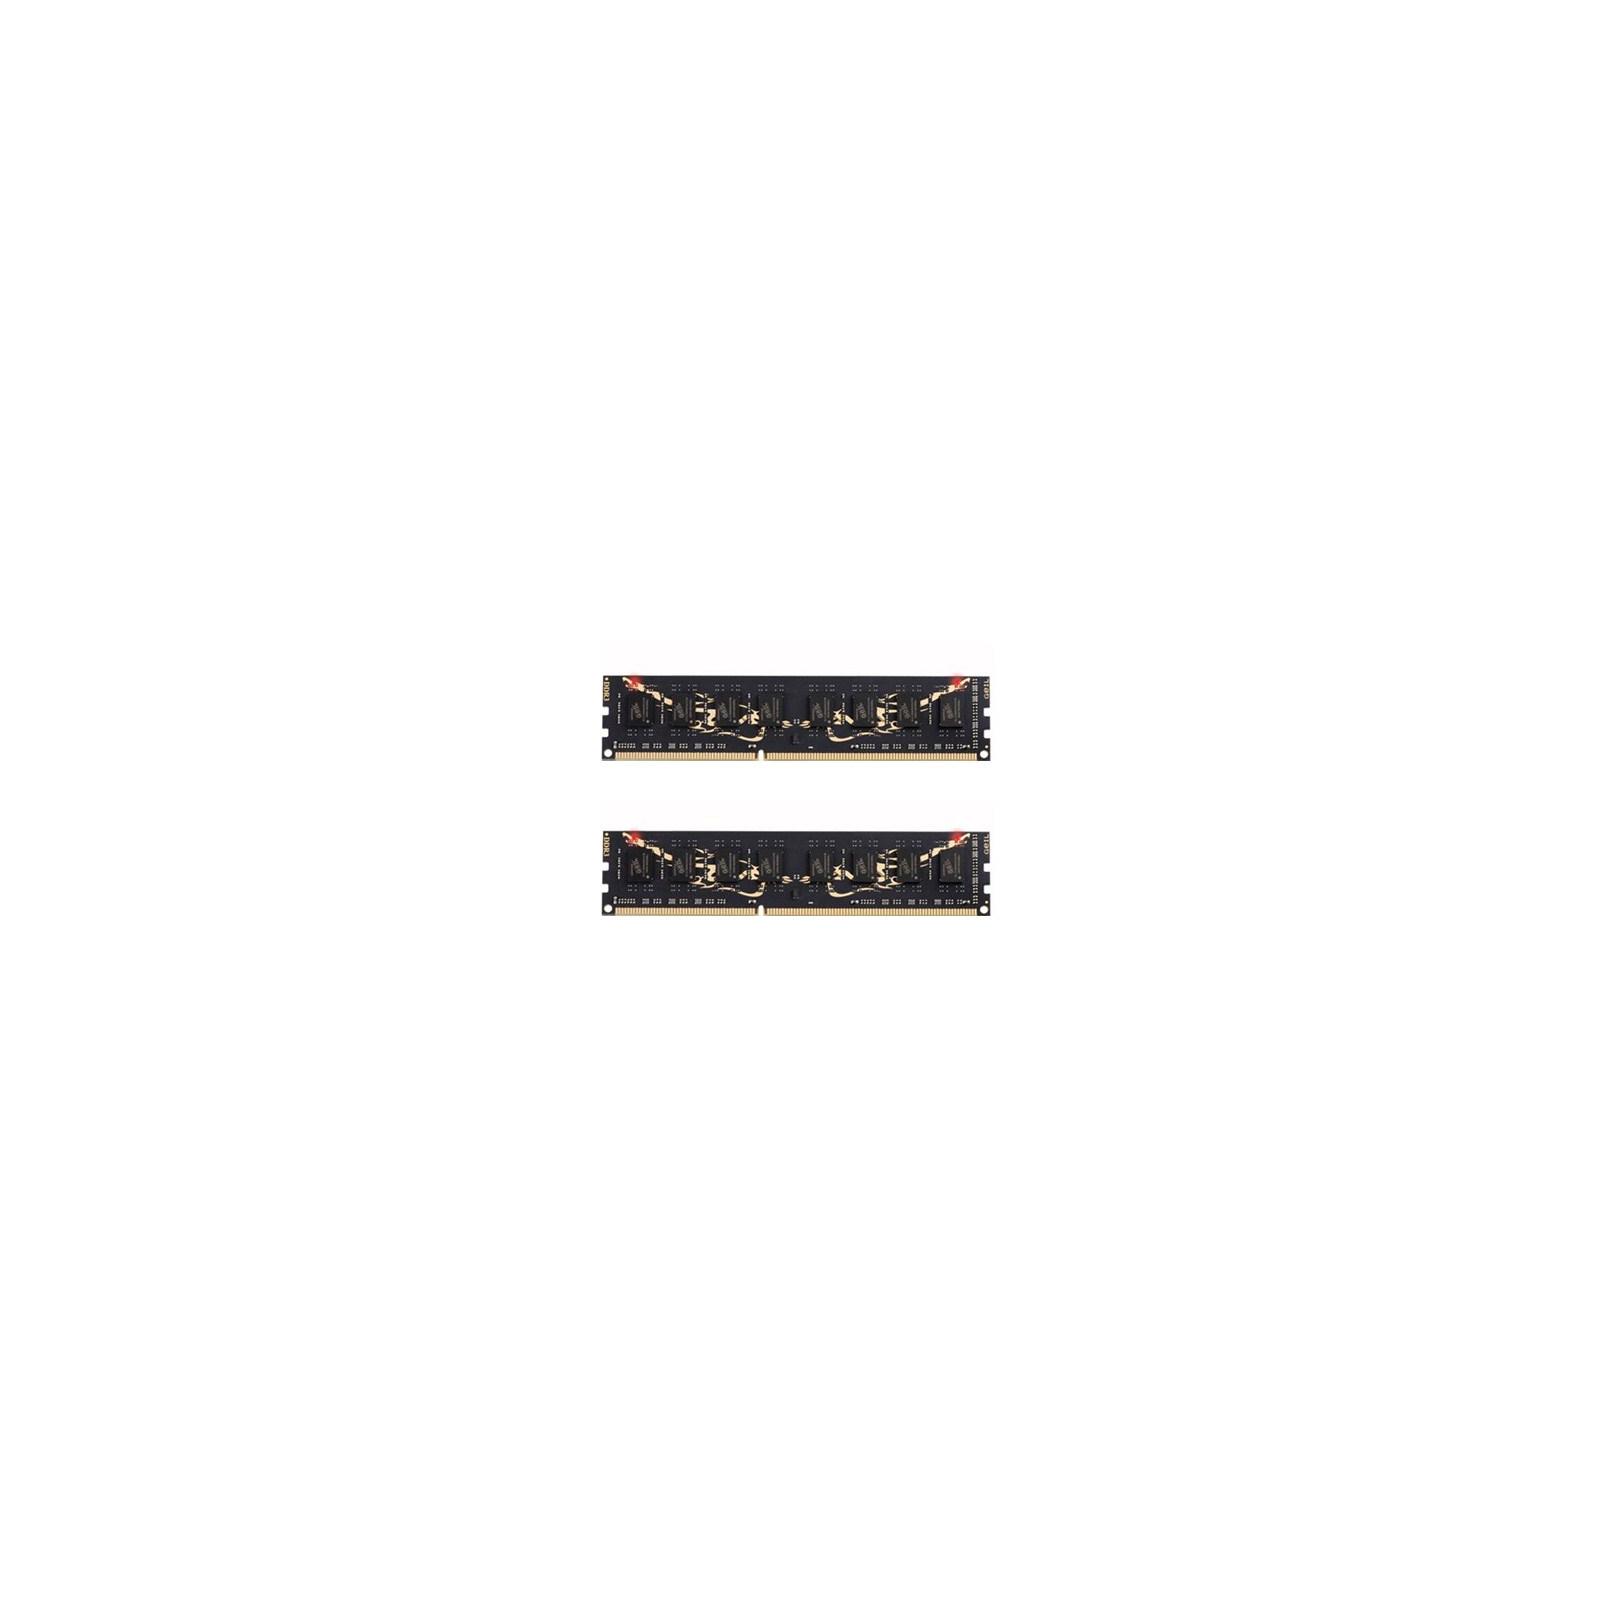 Модуль памяти для компьютера DDR3 8GB (2x4GB) 1333 MHz GEIL (GB38GB1333C9DC)